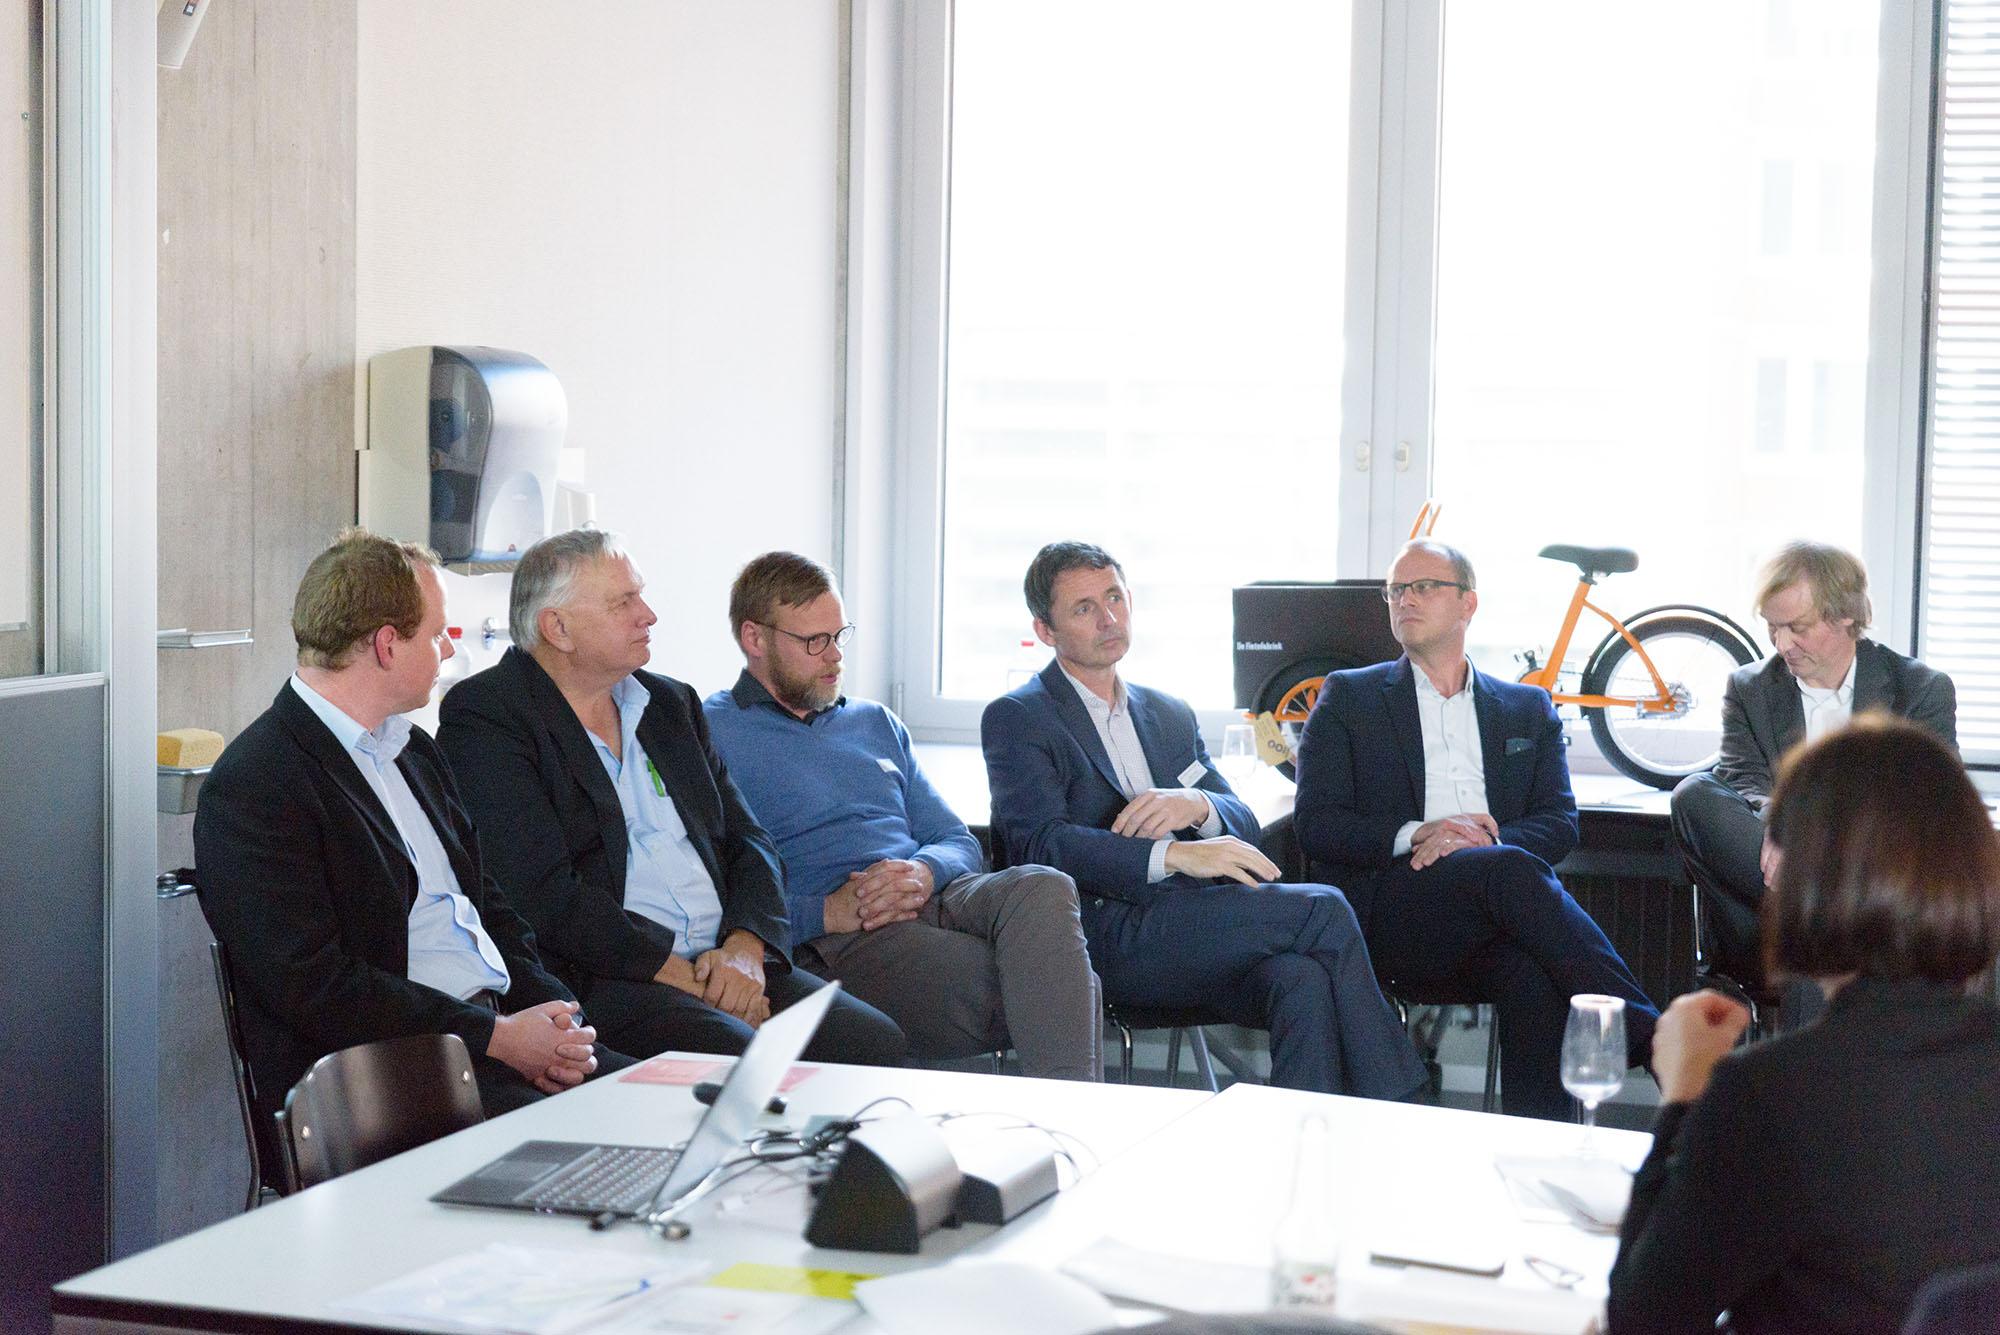 Frank Loacker, Christian Grasser, Roger Miauton, Jörg Beckmann, Adrian Müller, Patrik Aellig